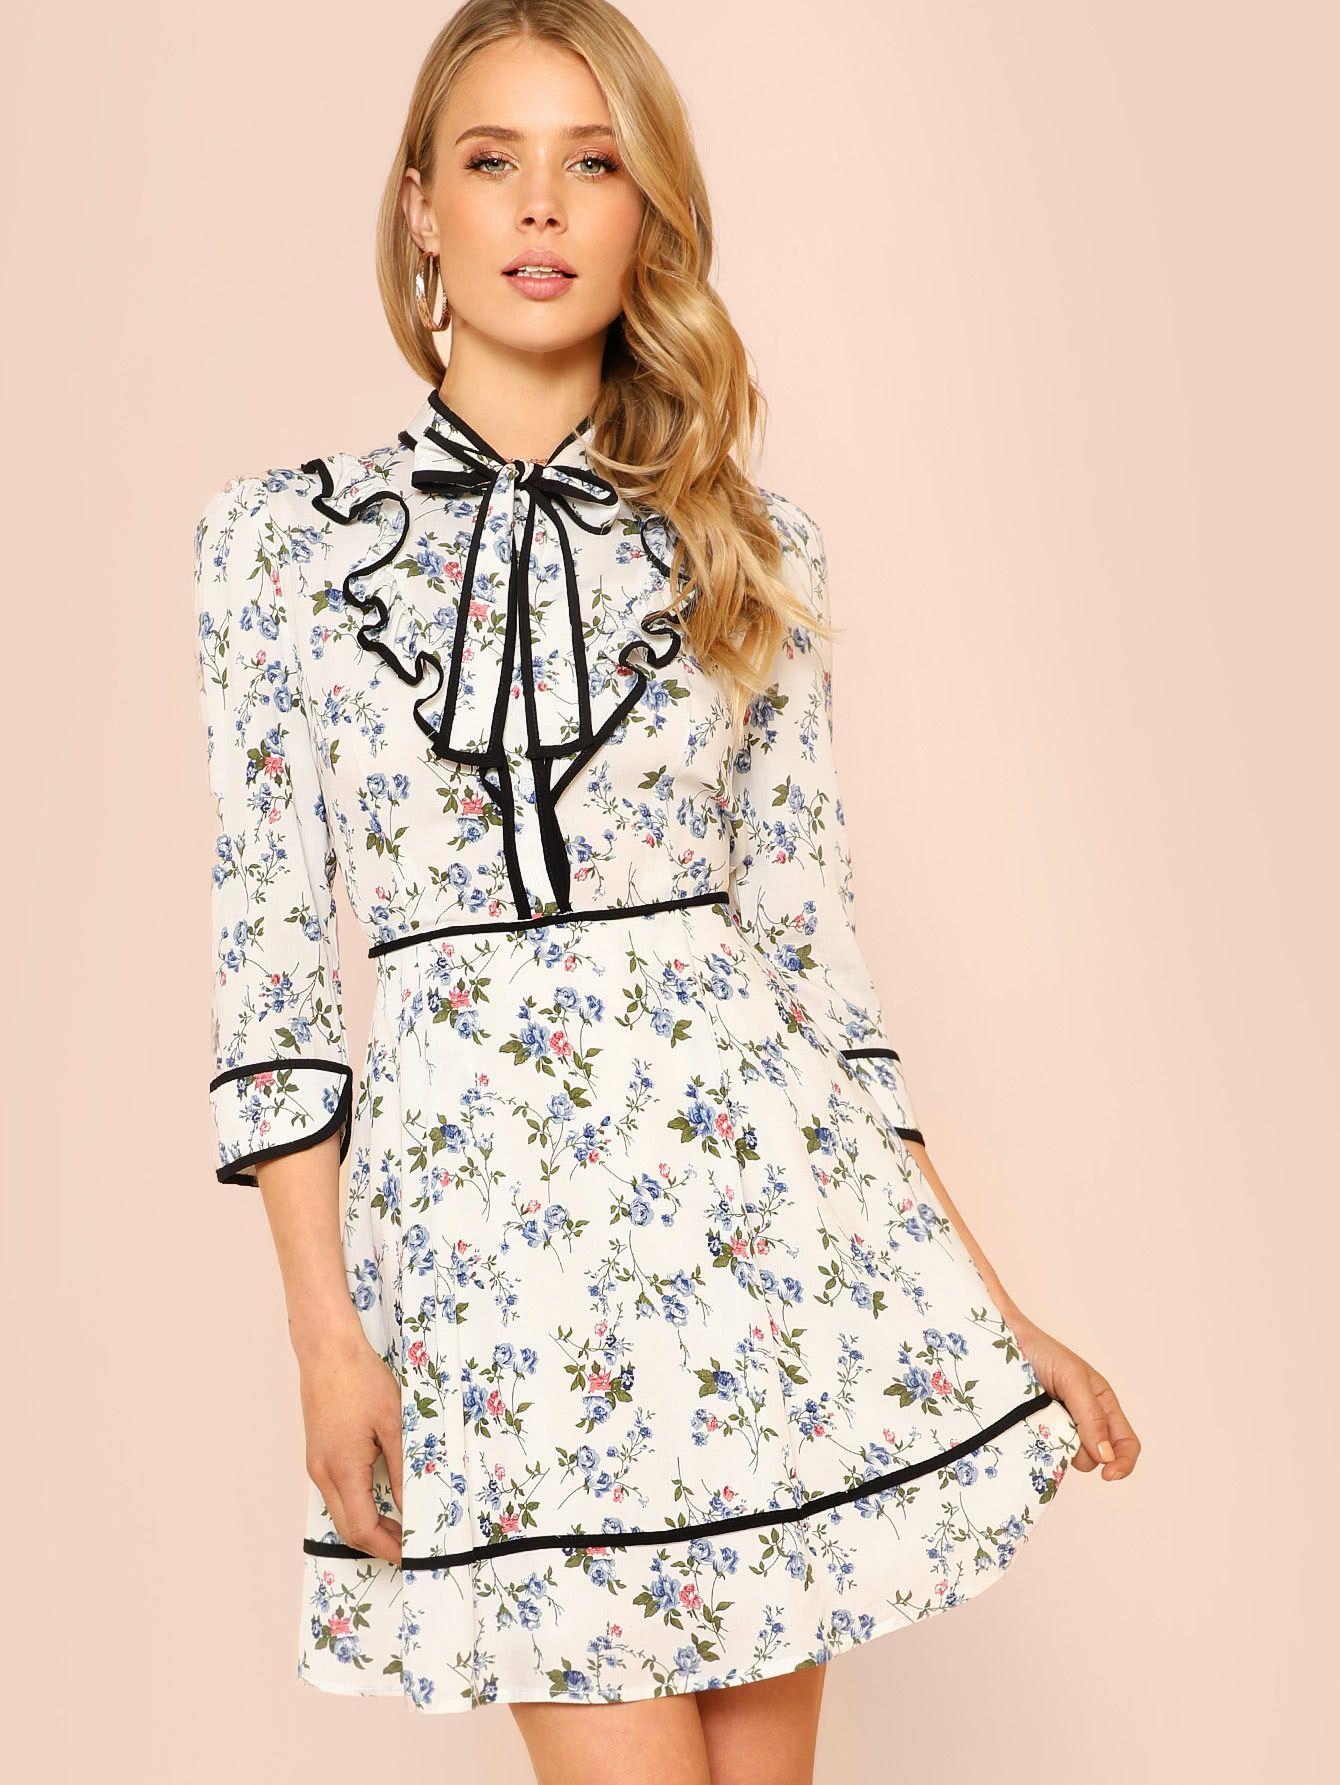 Flower print long sleeve peasant dress with ruffle collar